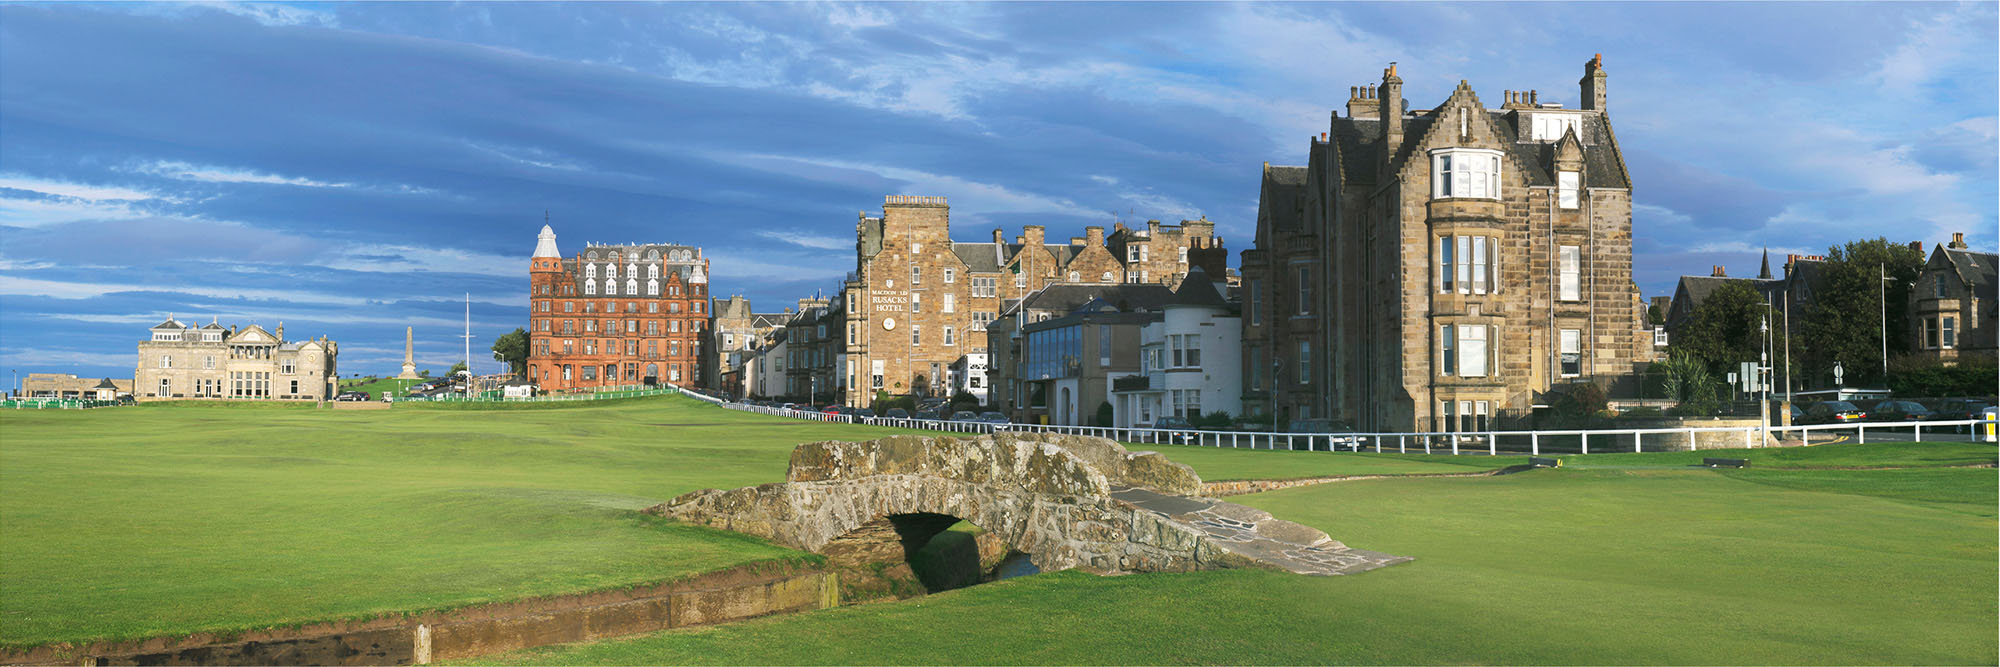 Golf Course Image - St Andrews Swilcan Bridge